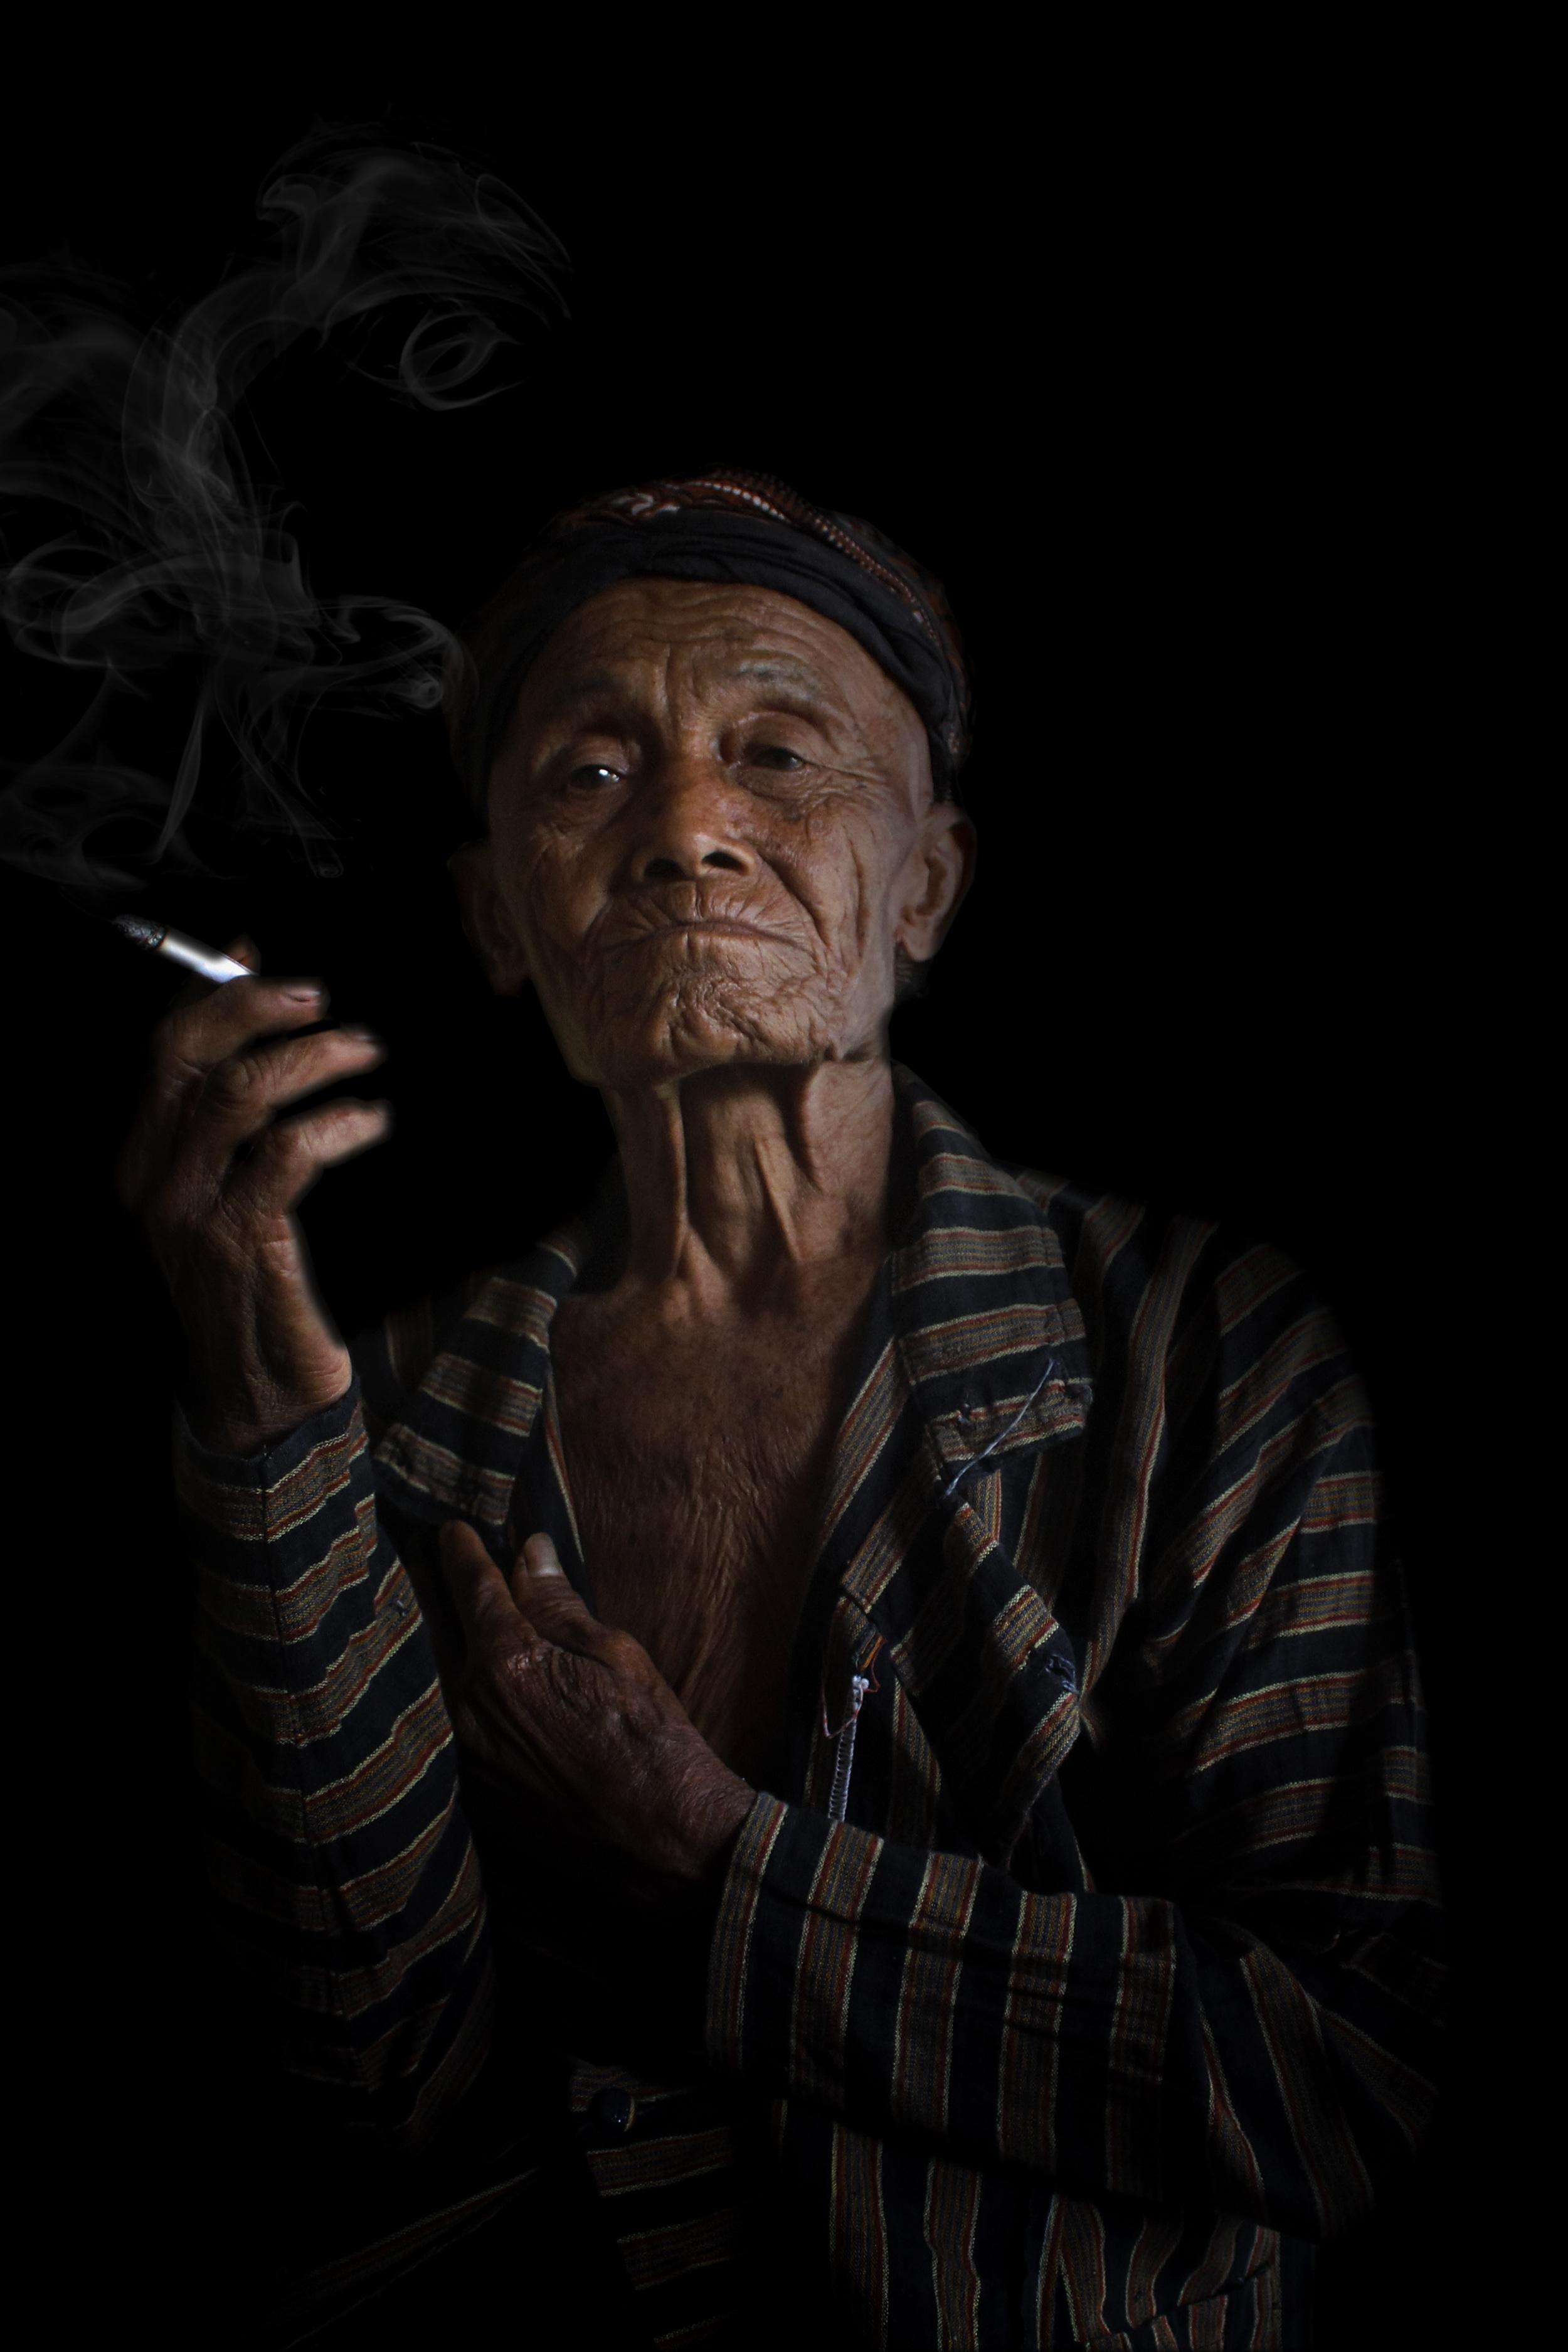 photography smoke portrait shadow darkness old man face art batik parents screenshot special effects 757282